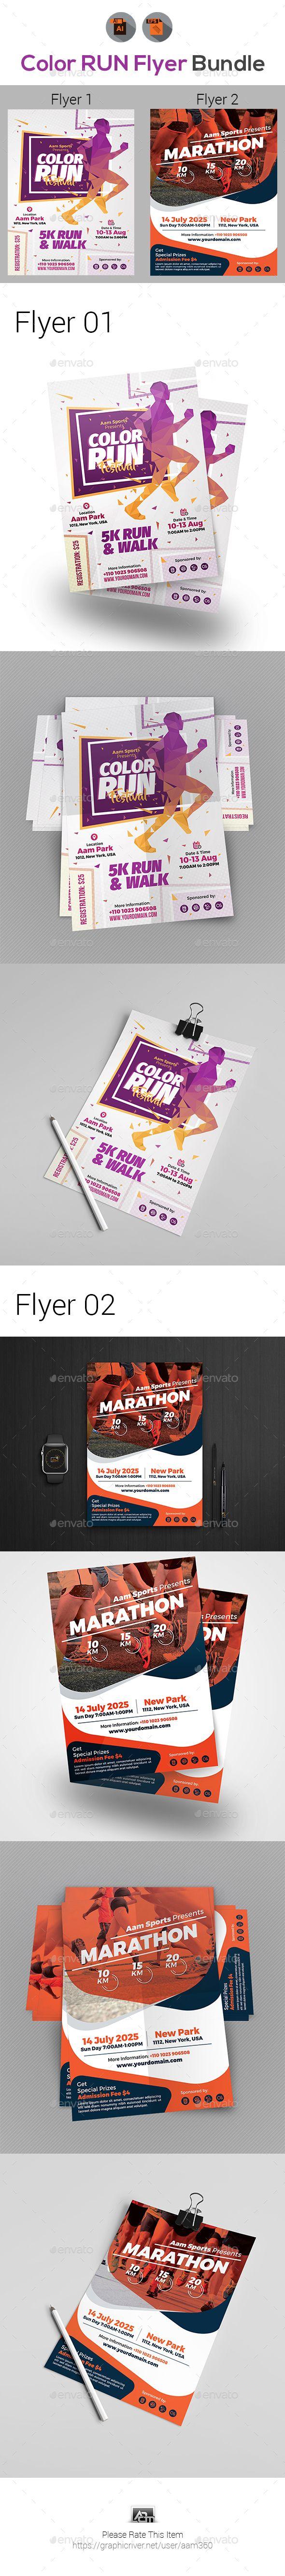 5k run flyer template mersn proforum co